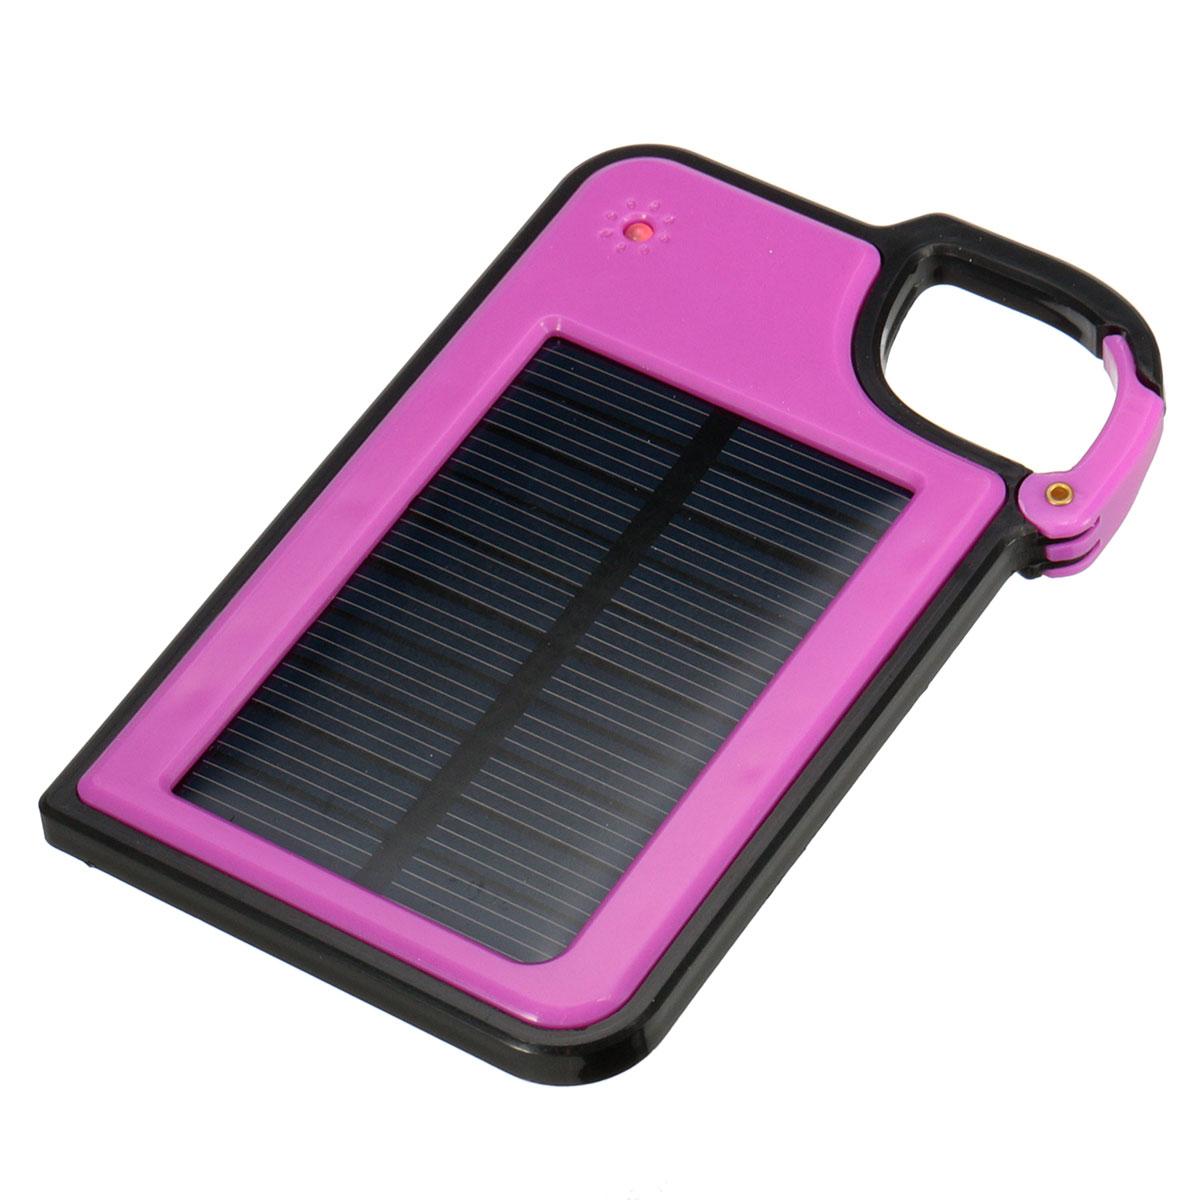 extern solar panel ladeger t power bank usb batterie akku. Black Bedroom Furniture Sets. Home Design Ideas